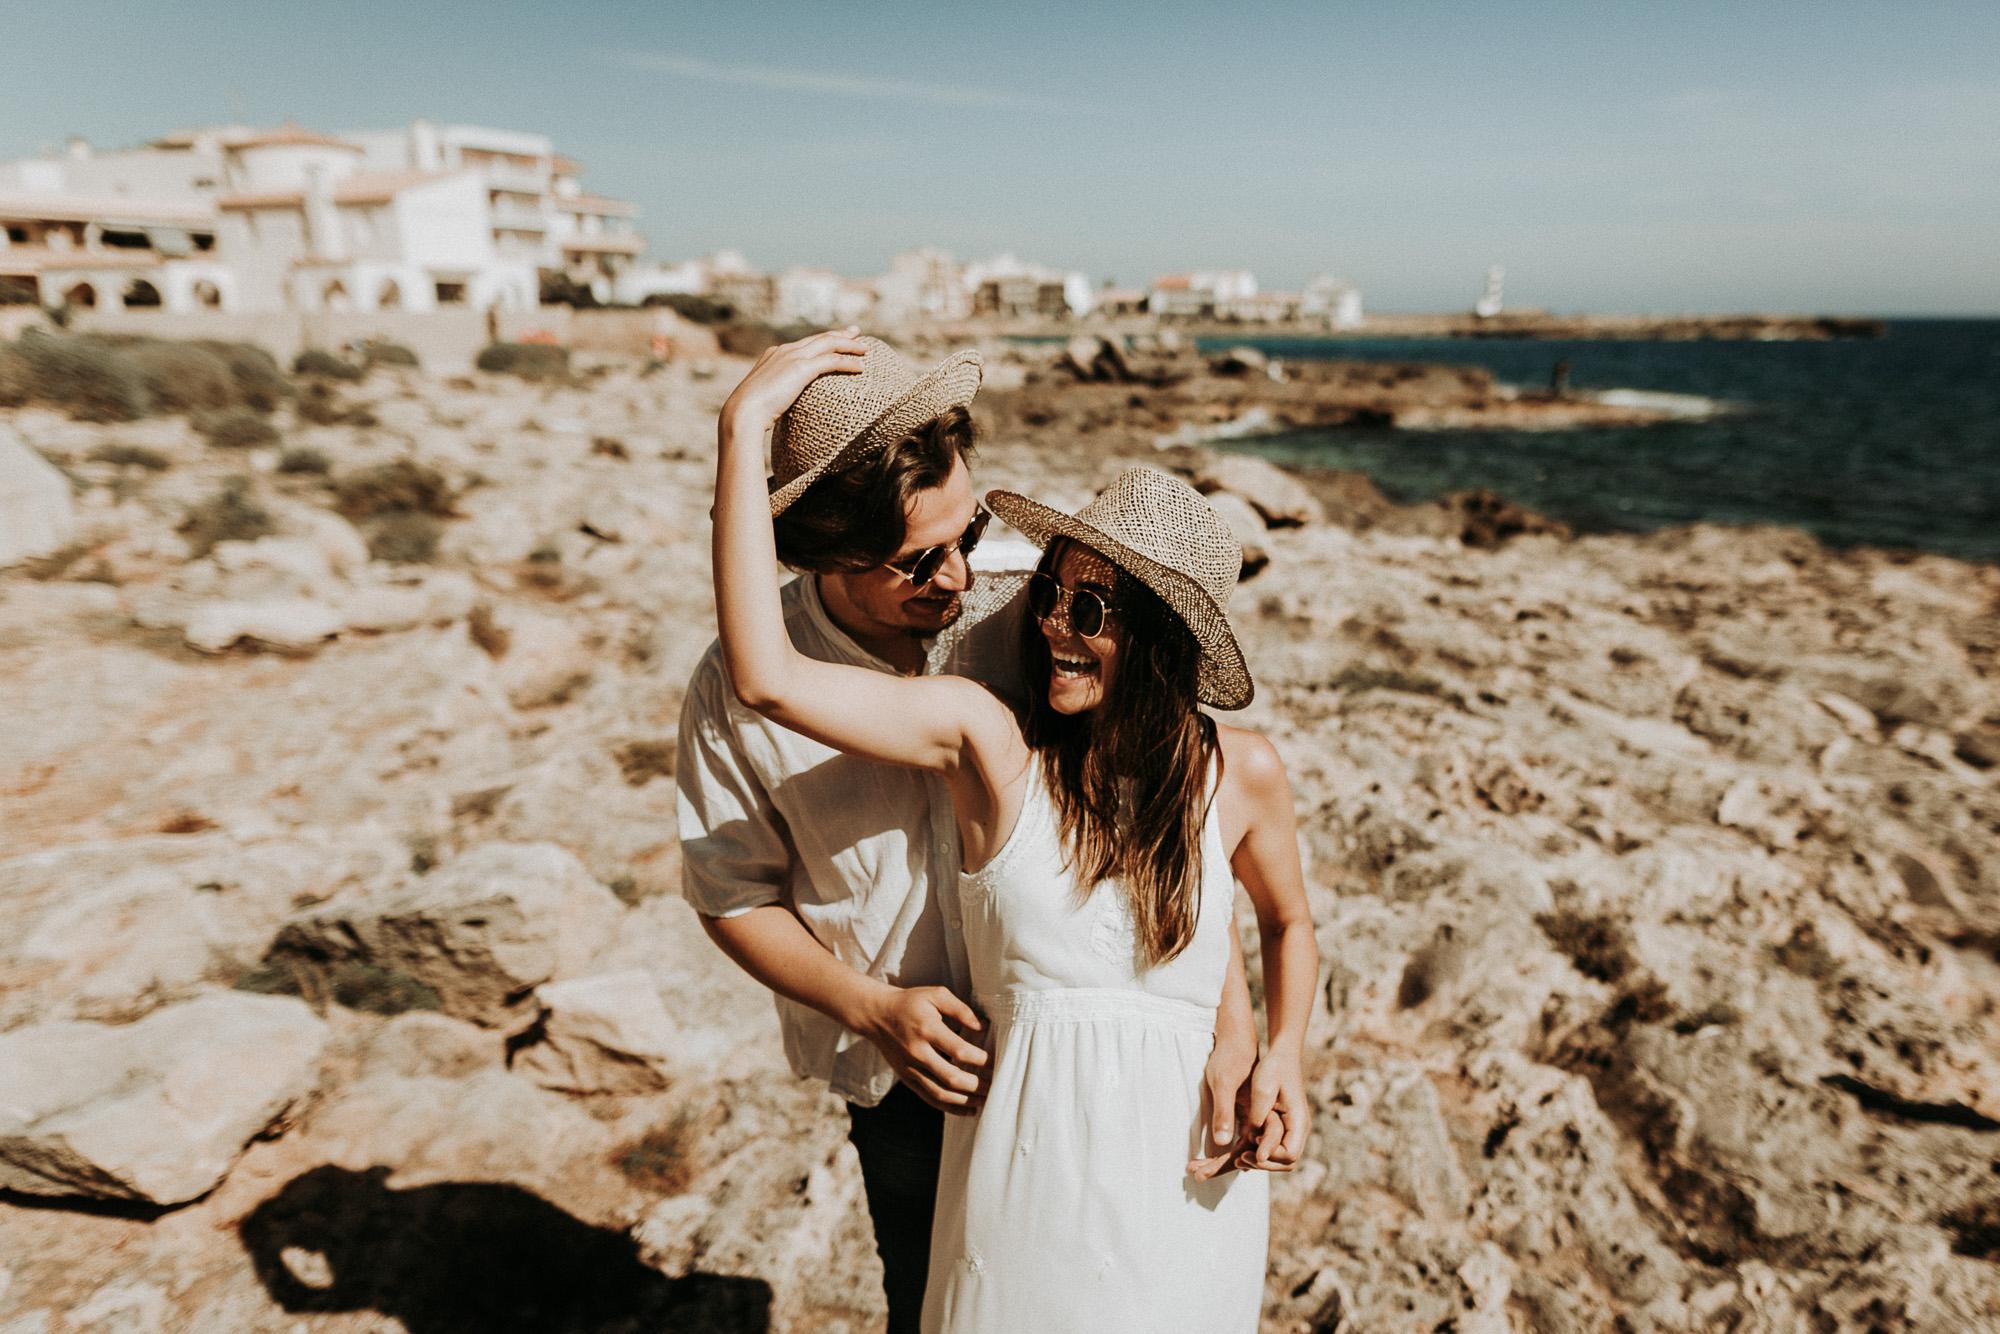 DanielaMarquardtPhotography_wedding_elopement_mallorca_spain_stjordi_sessalines_marinaandxavi338